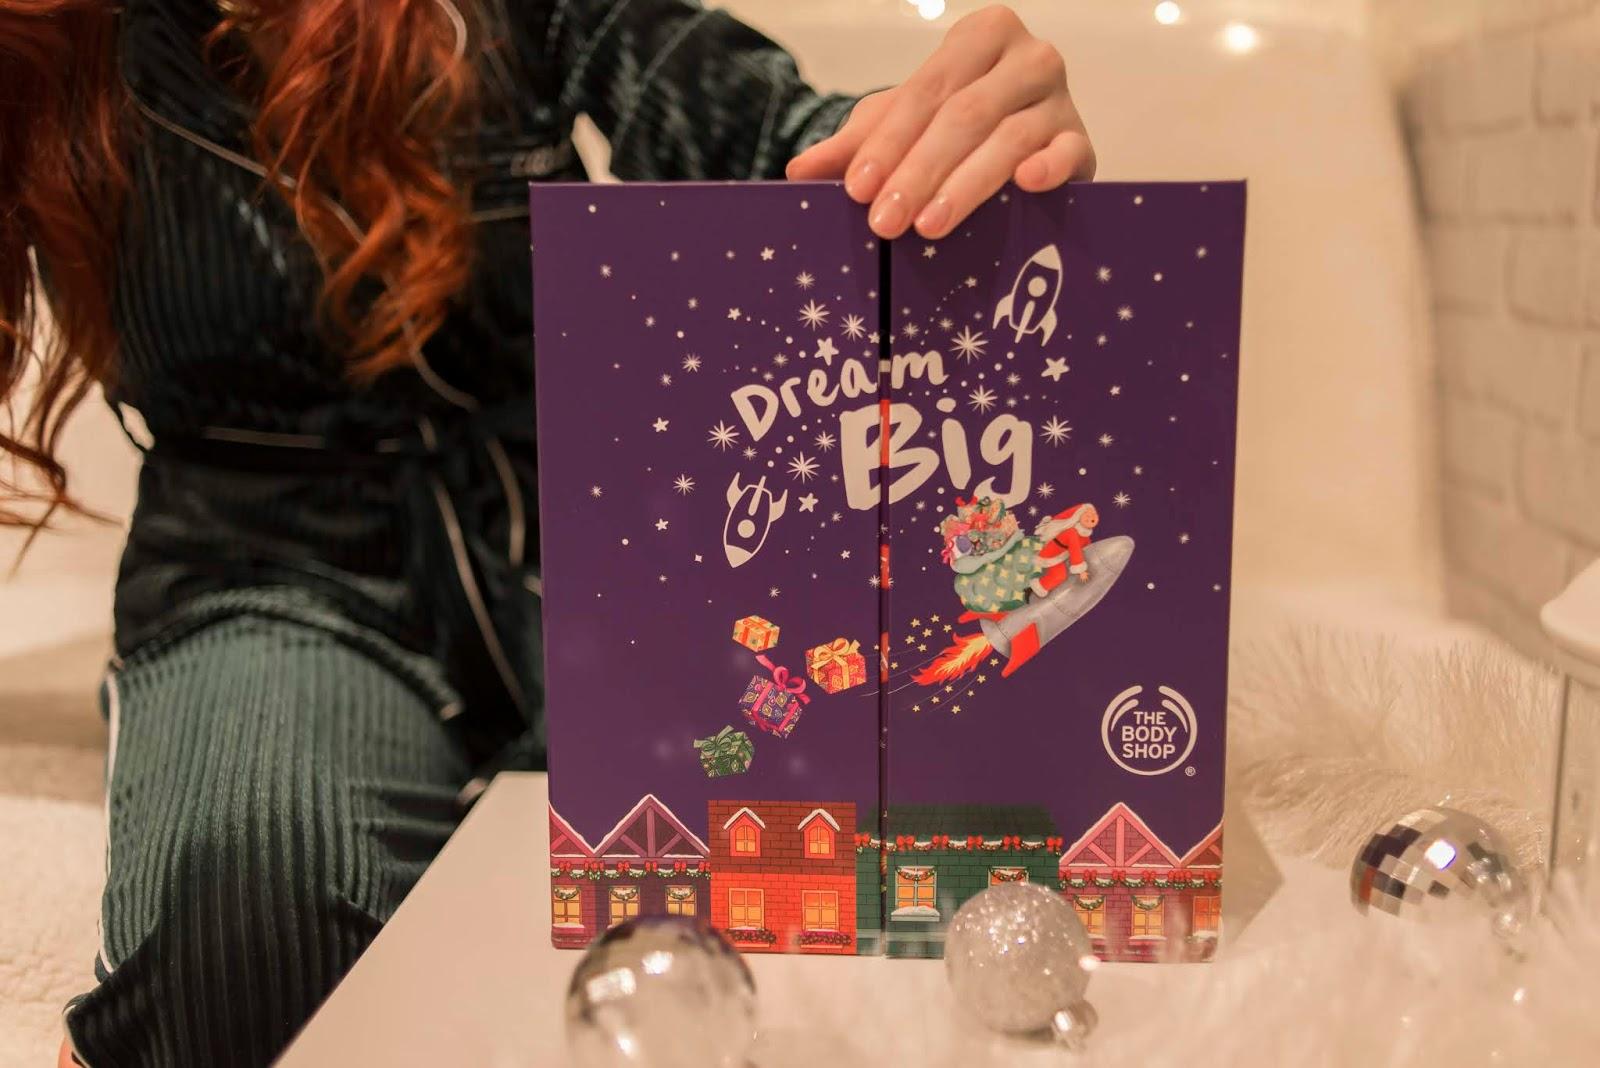 http://www.recklessdiary.ru/2019/12/the-body-shop-veganskaya-vegeterianskaya-kosmetika-bodi-shop-juicy-prar-warm-vanilla-rich-plum.html